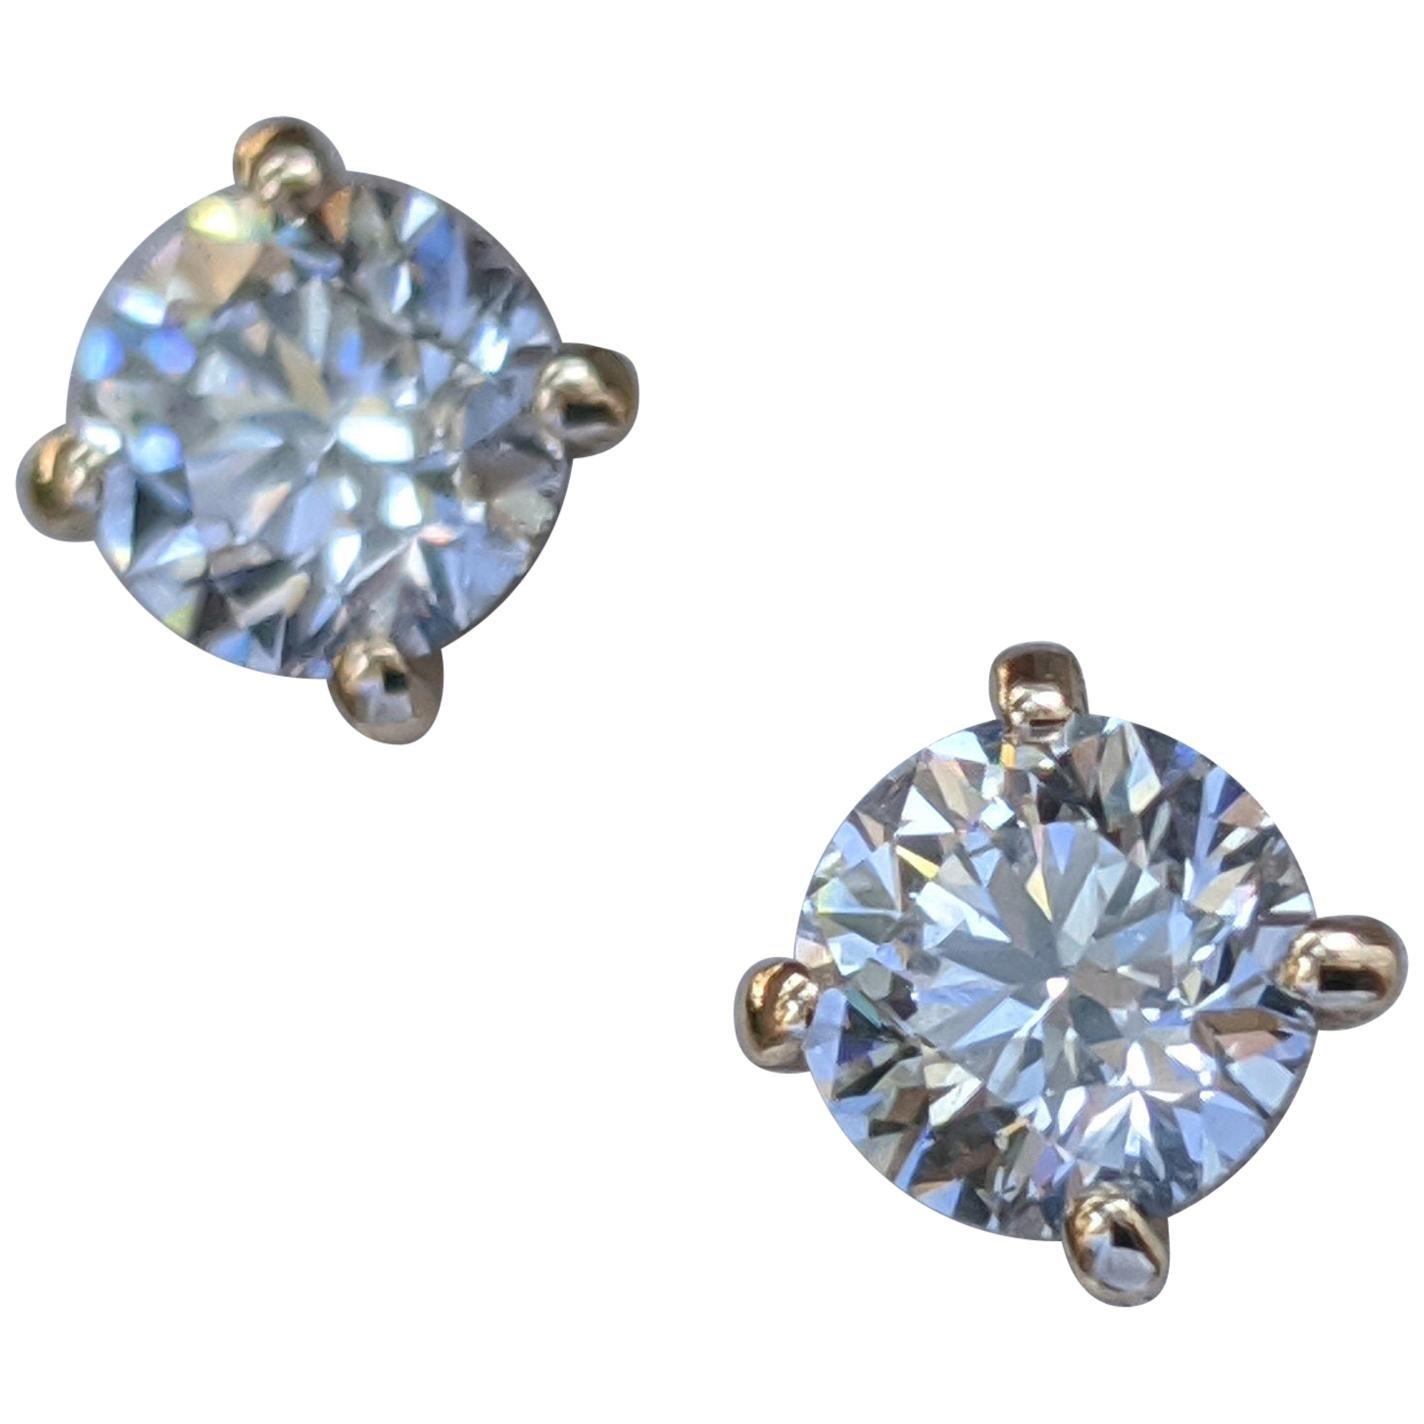 0.80 Carat Round Diamond Stud Earrings, 14 Karat Yellow Gold Earring Studs